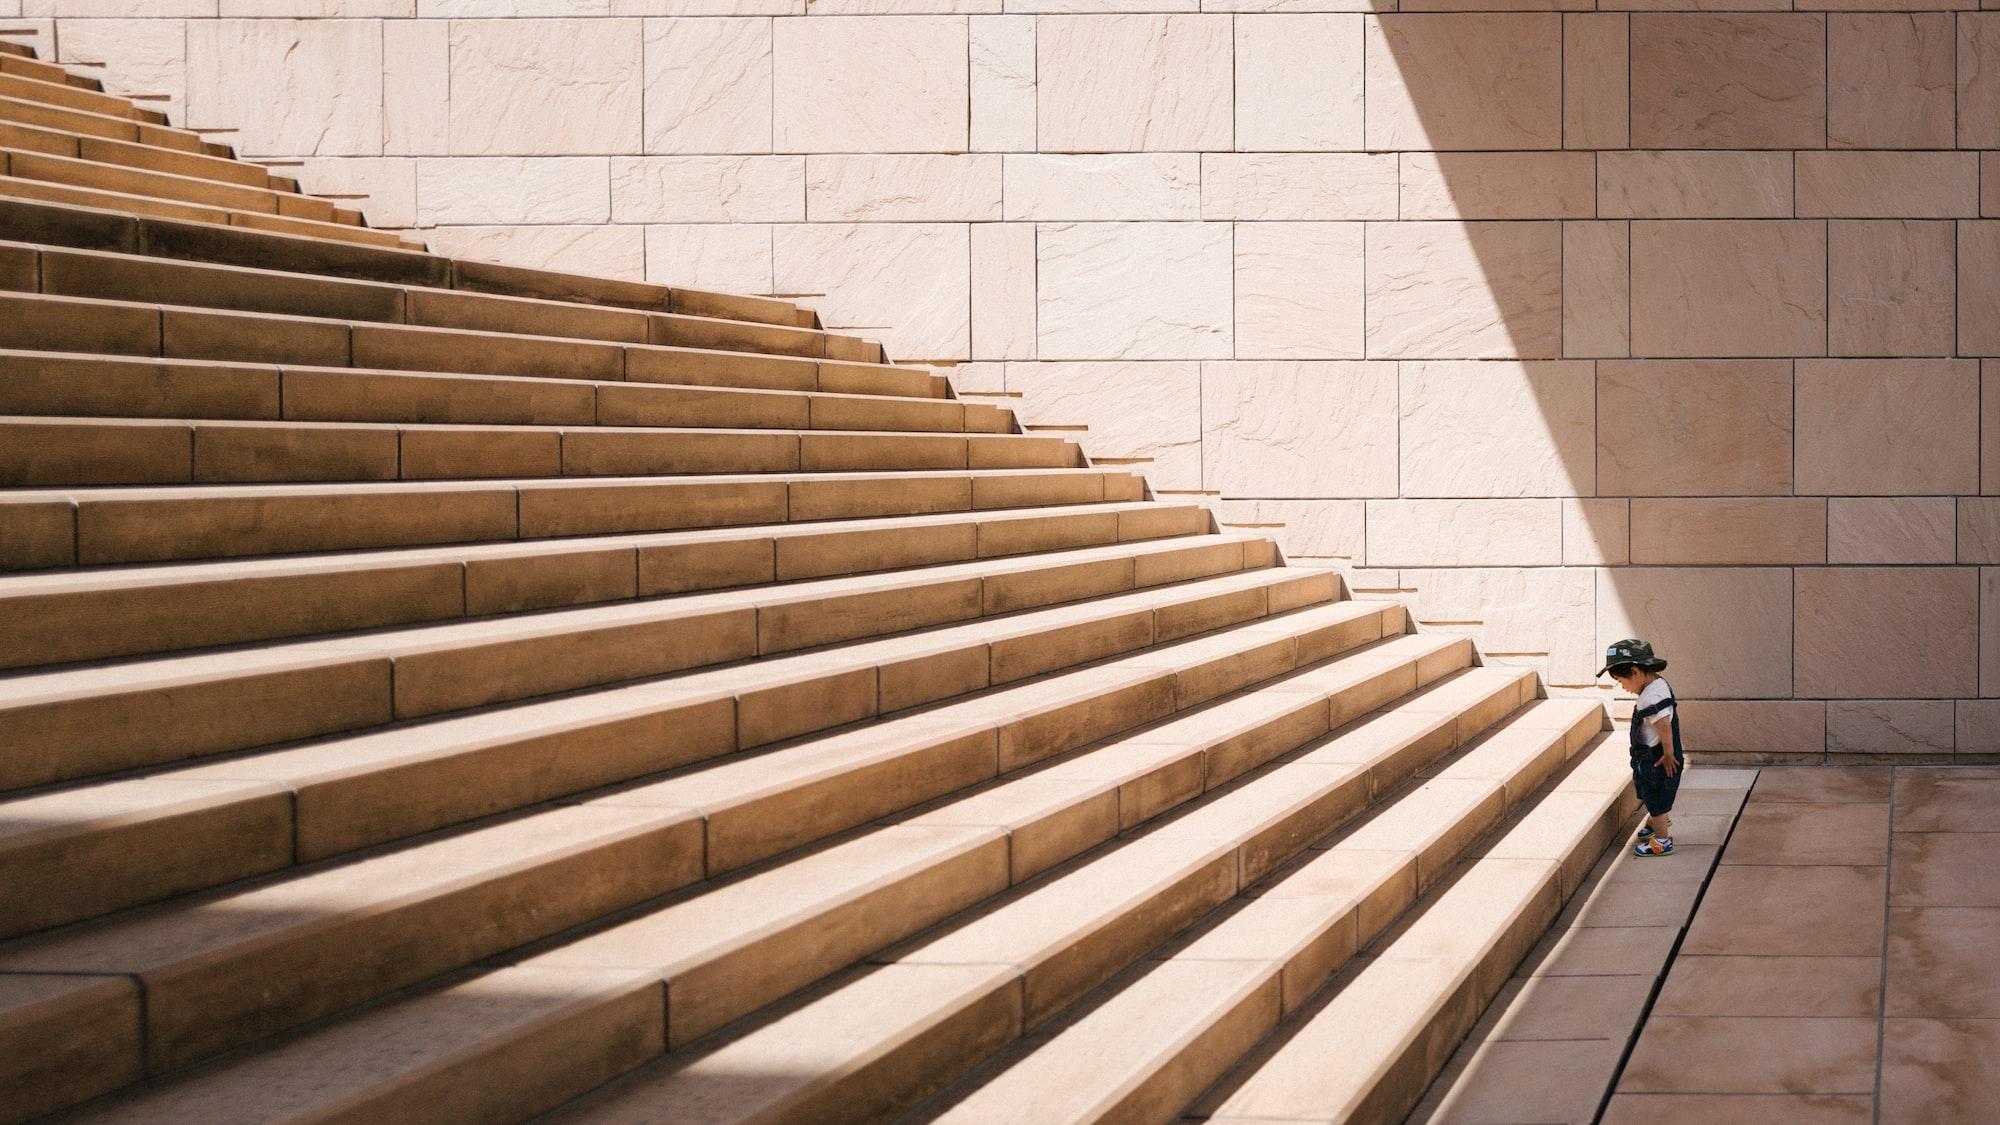 5 Resources To Kickstart Your Marketing Career